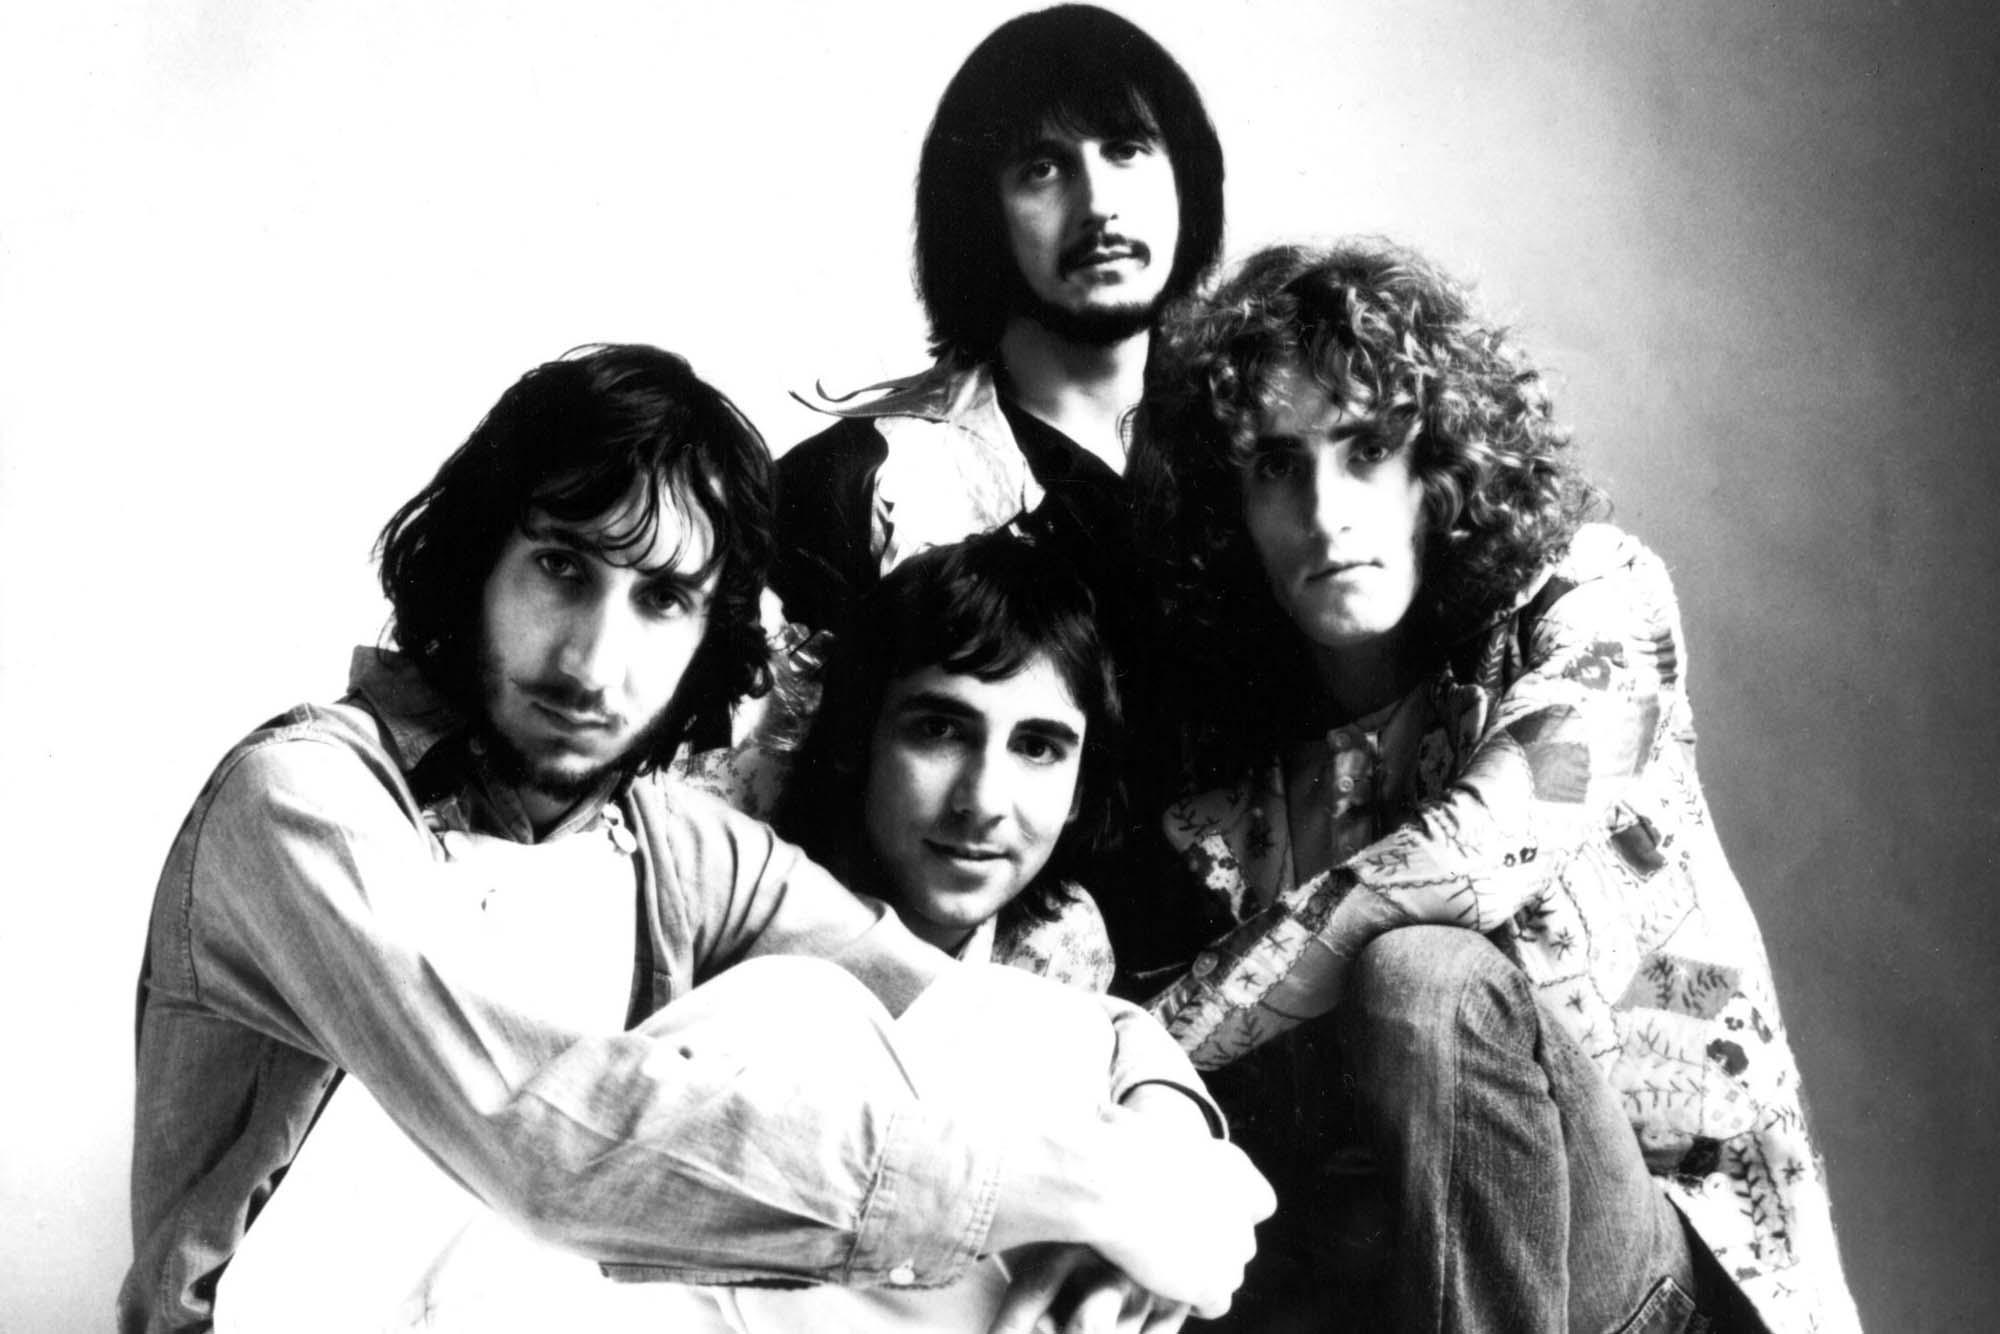 The Who, Pete Townshend, Keith Moon, John Entwistle, Roger Daltrey, circa late 1970's.